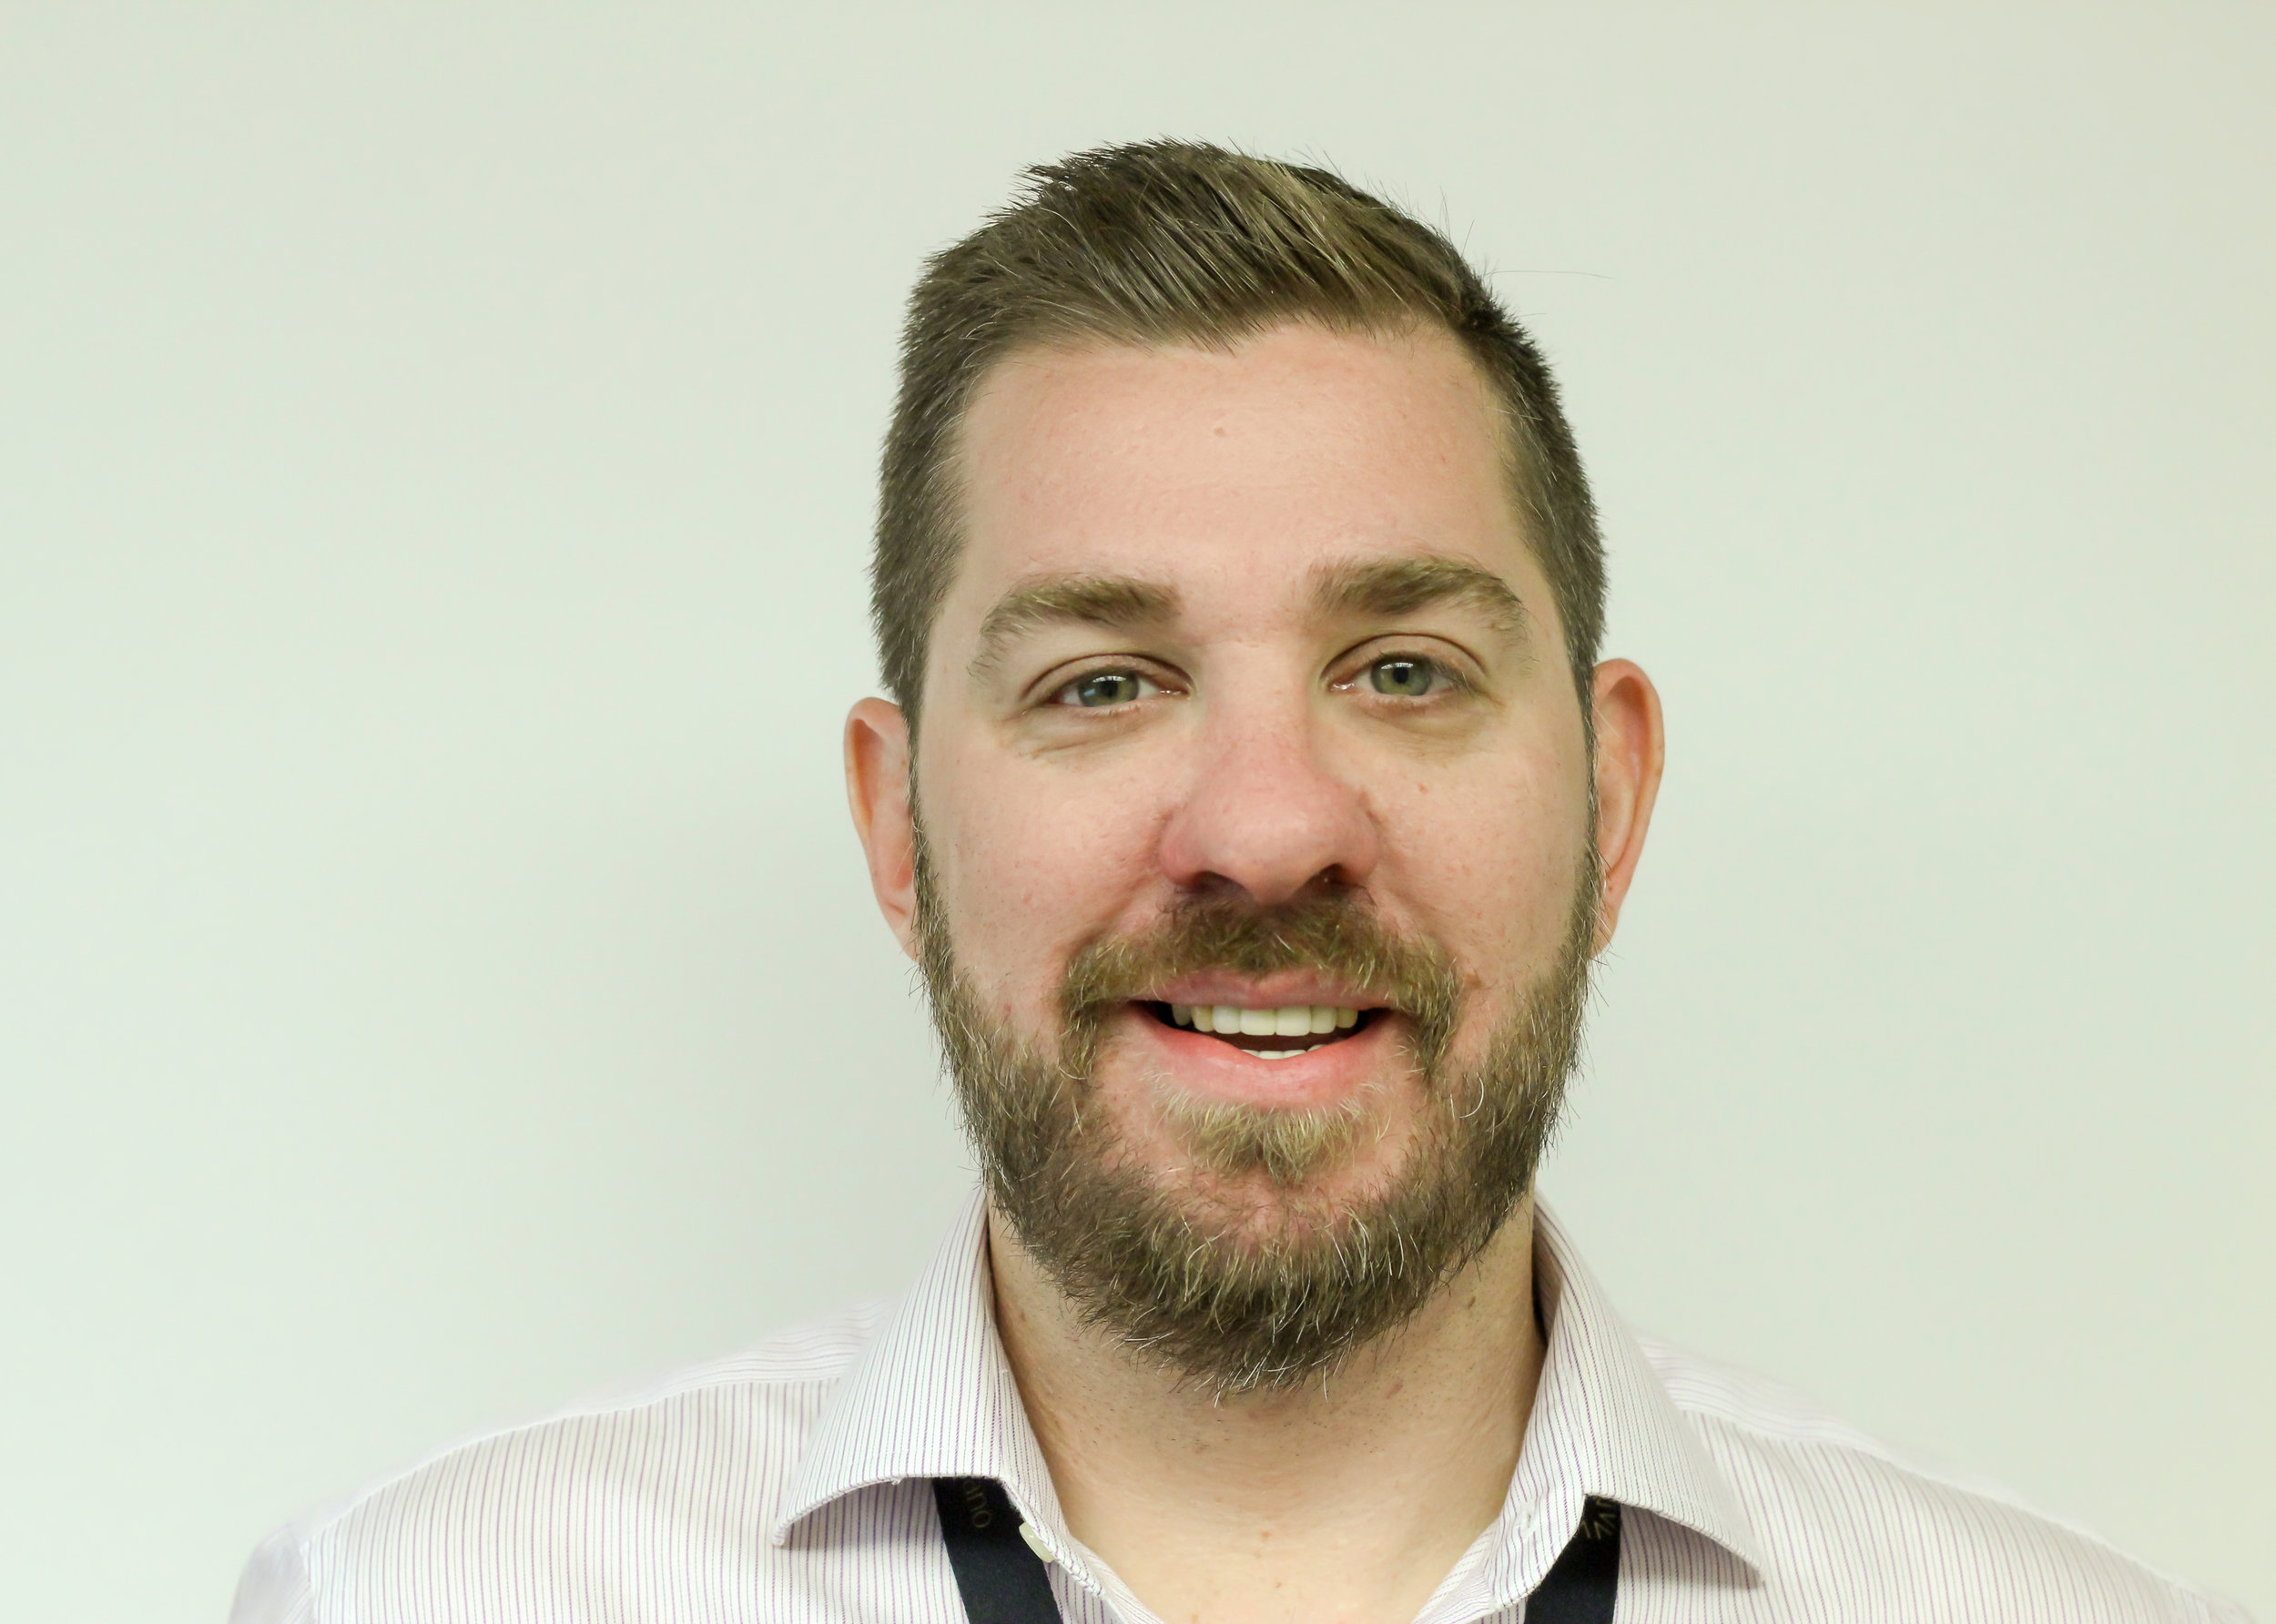 Anthony Darby, Peninsula Alternative Health Chief Executive Office